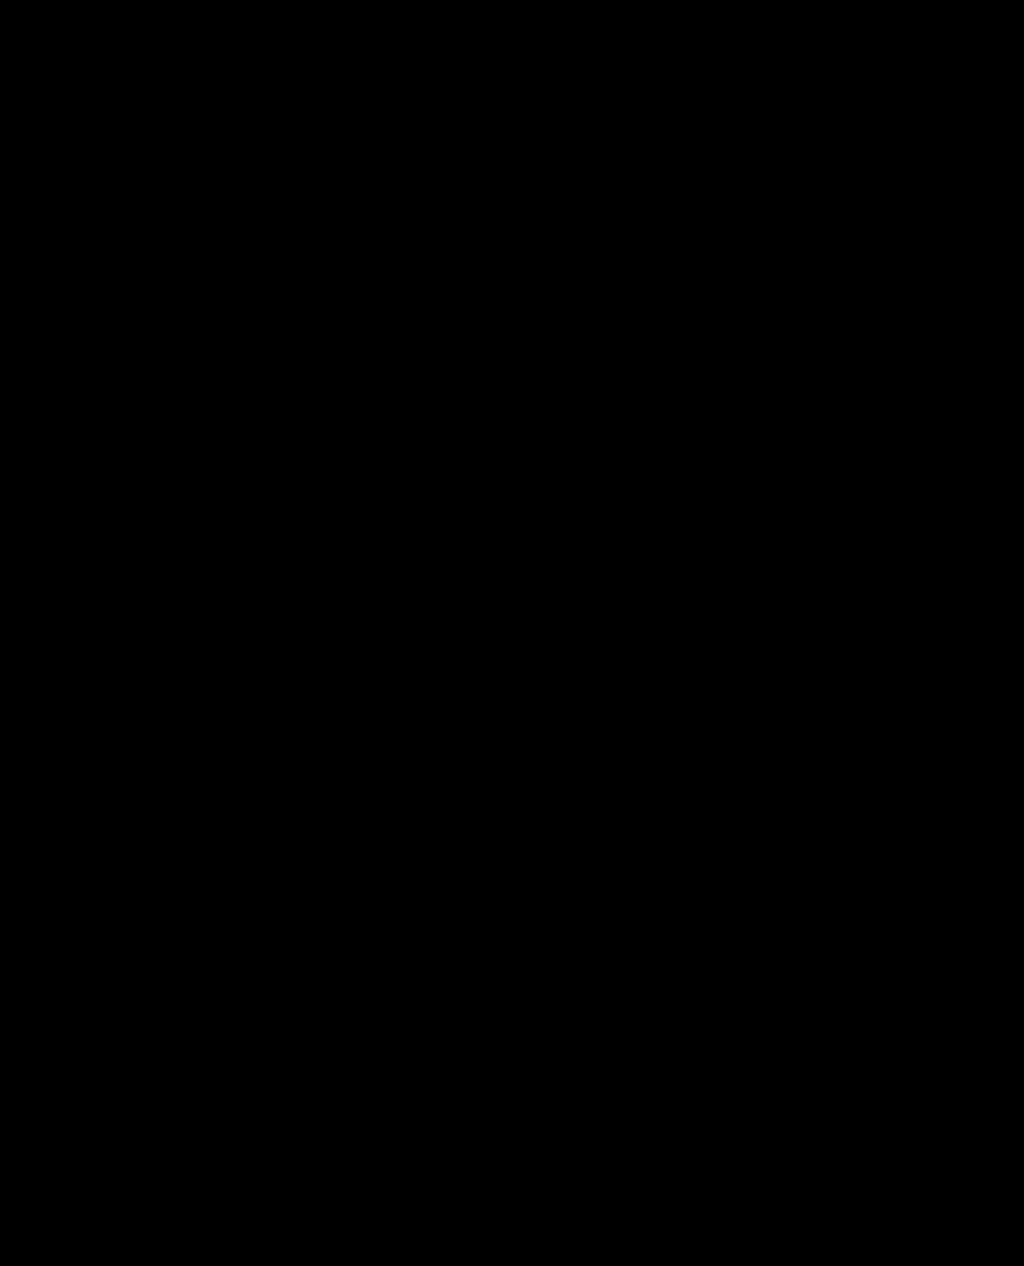 Naruto 647 - Lineart